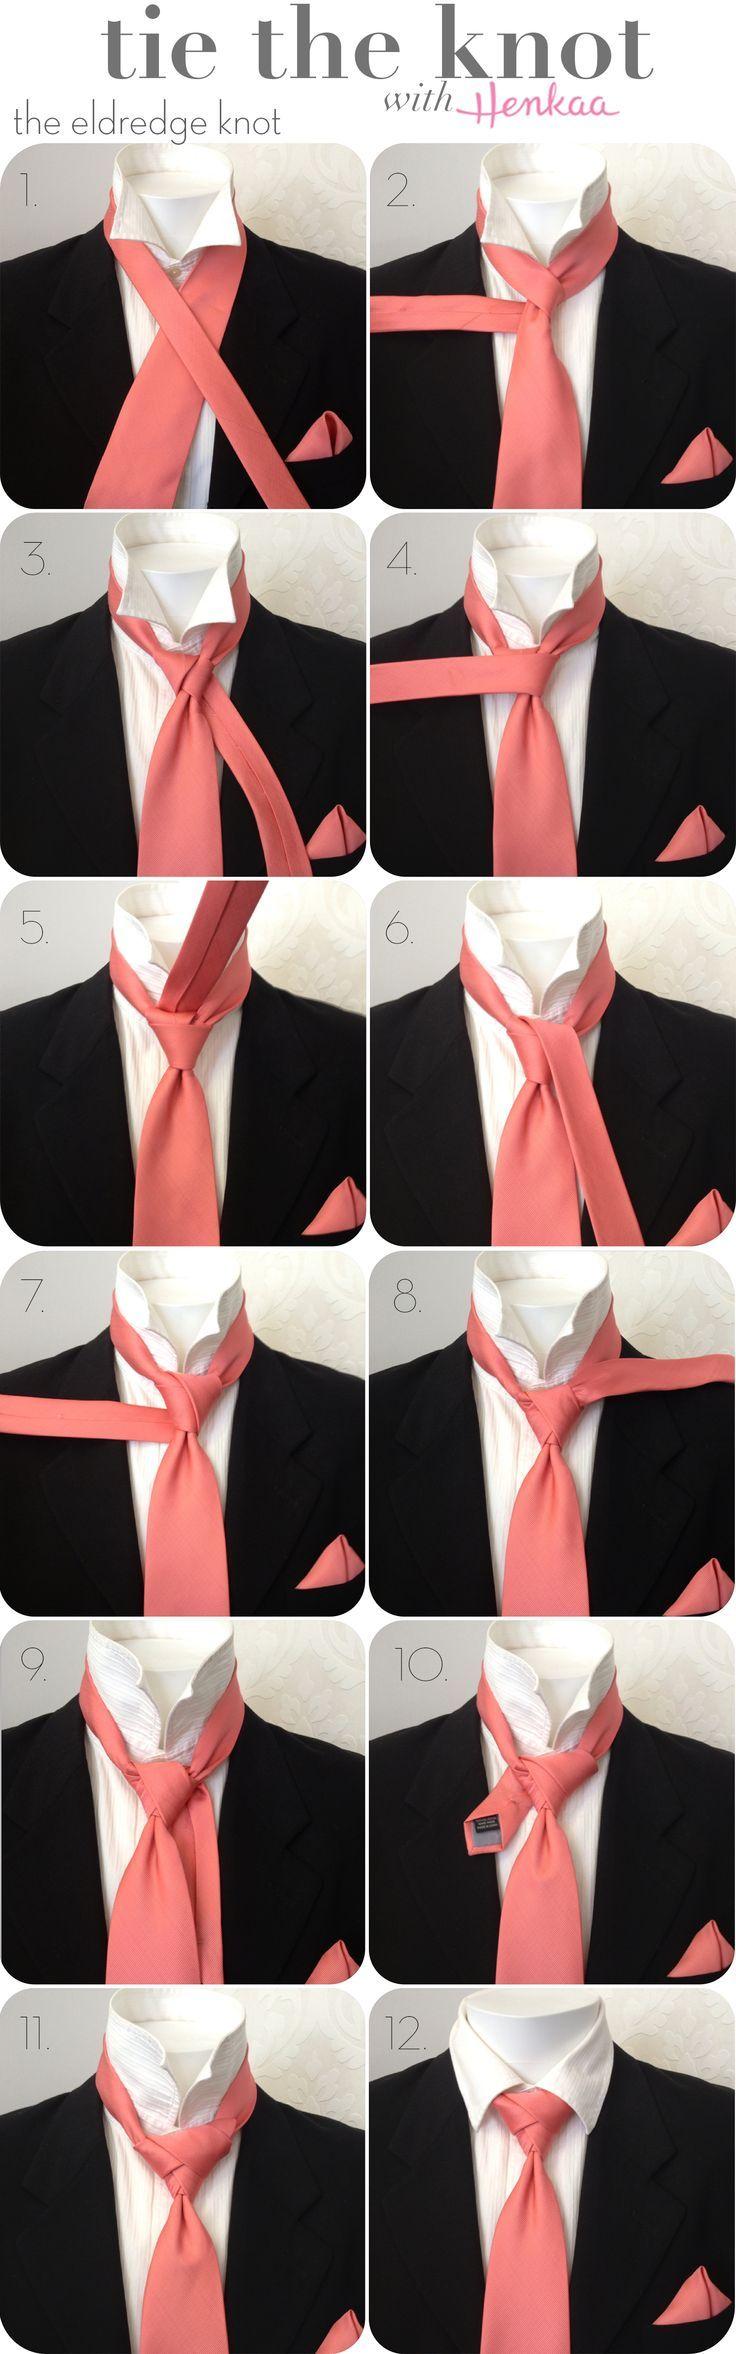 How to tie a necktie eldredge knot click through for the how to how to tie a necktie eldredge knot click through for the how to tie ccuart Gallery